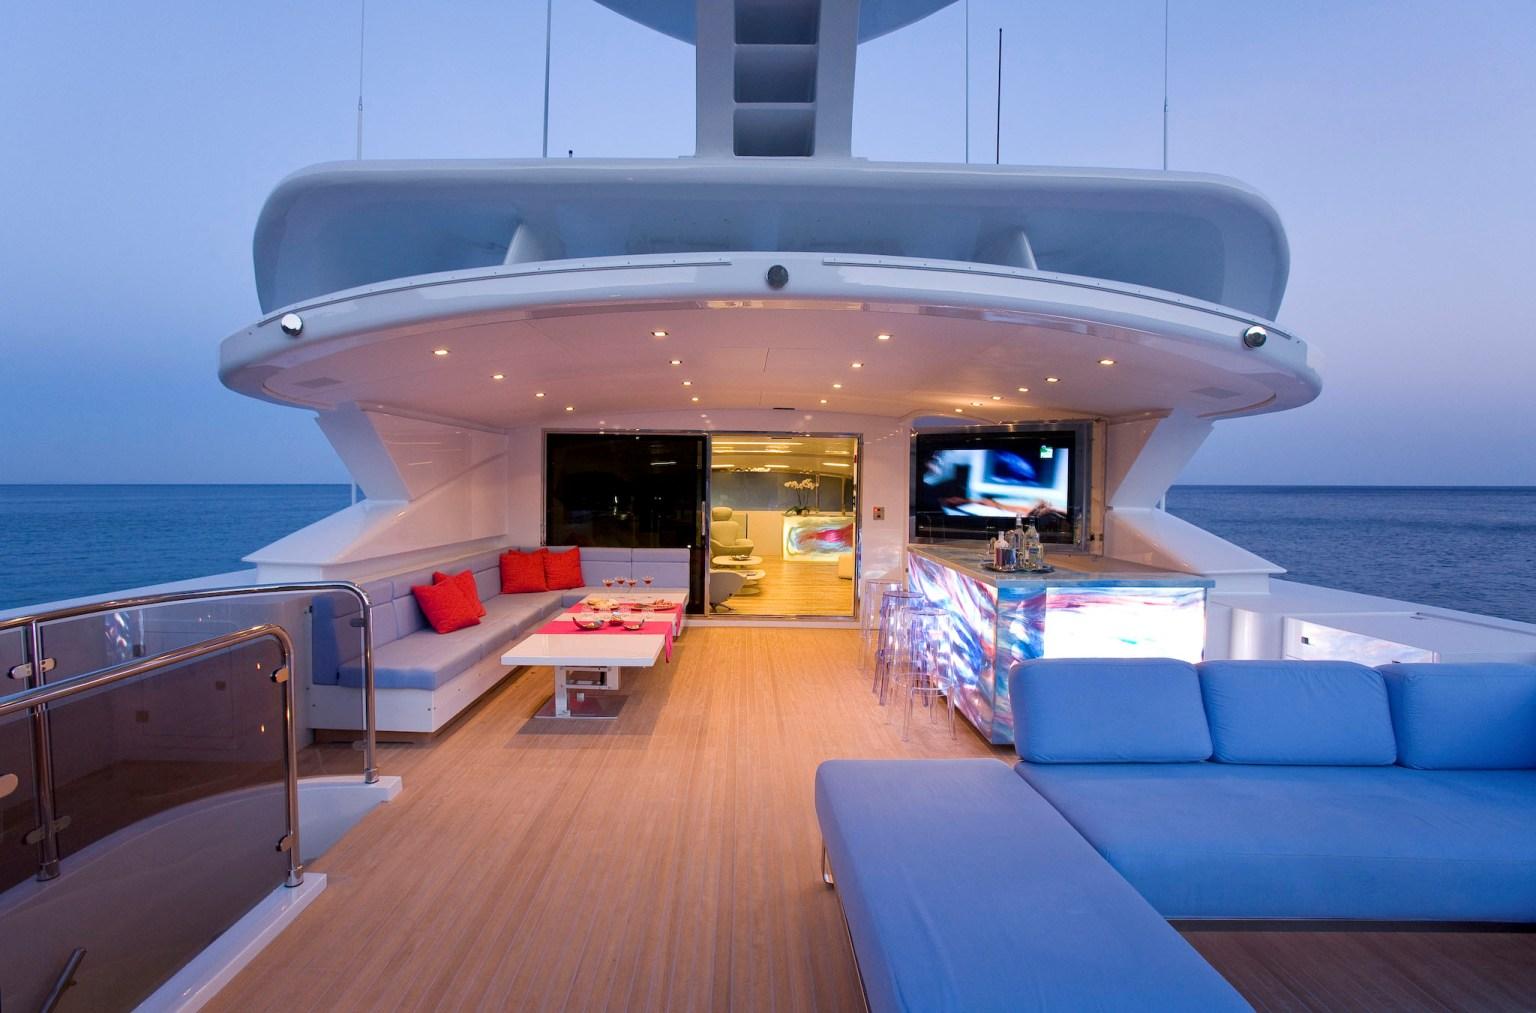 PANTHER II luxury motor yacht pic 04